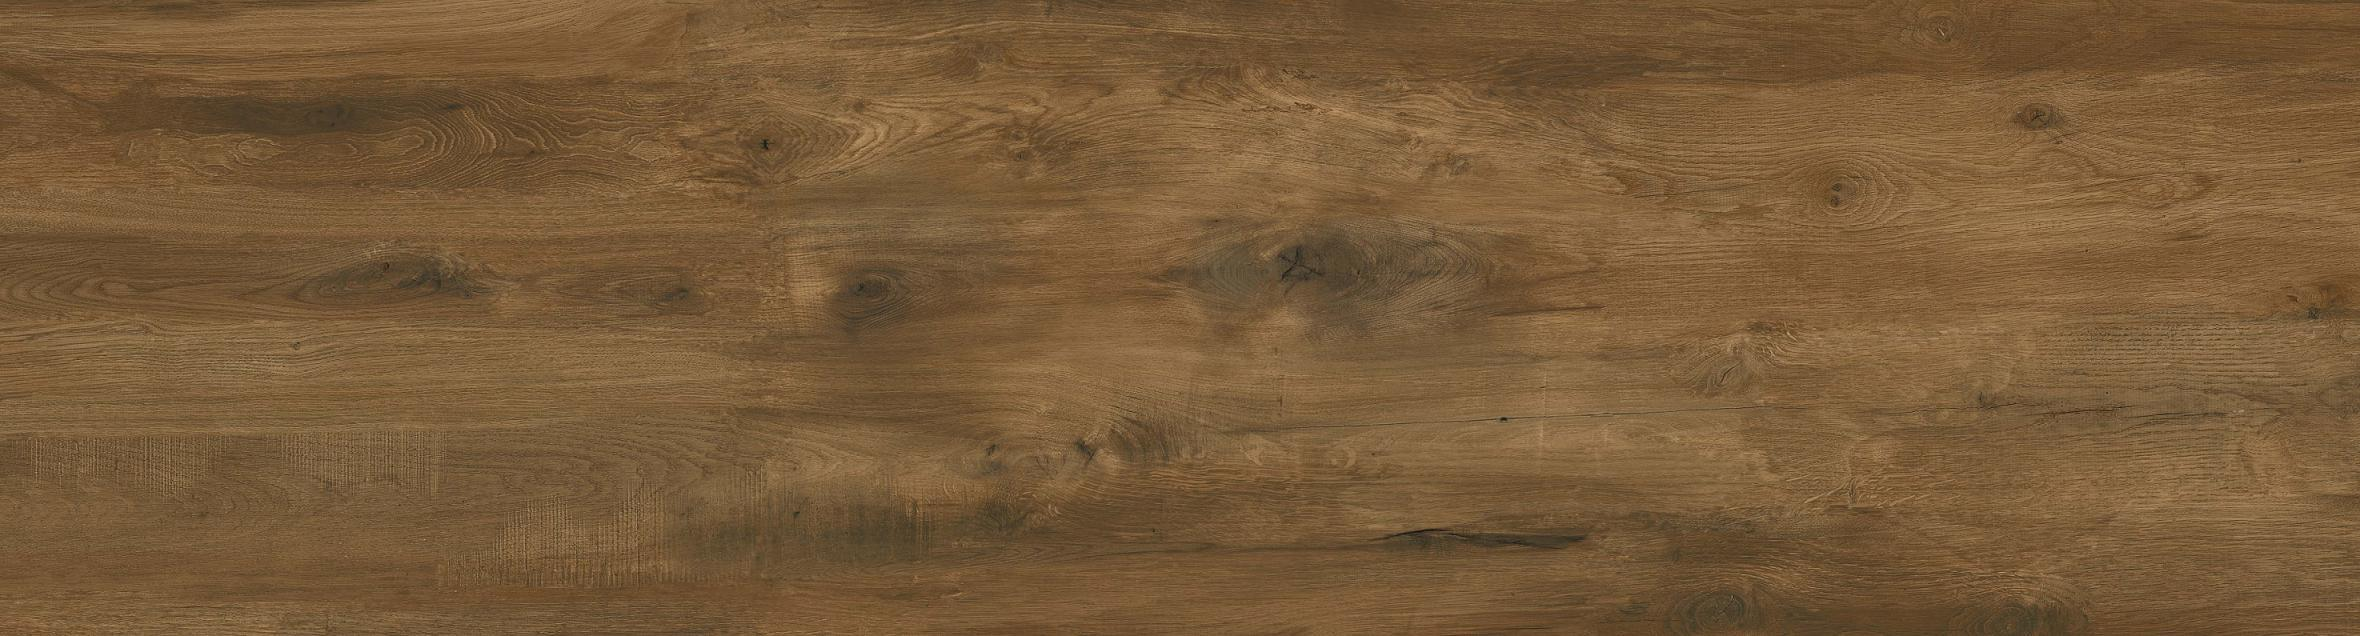 High Quality Building Material Porcelain Wood Tile Floor Tile Lnc2012021 Brown